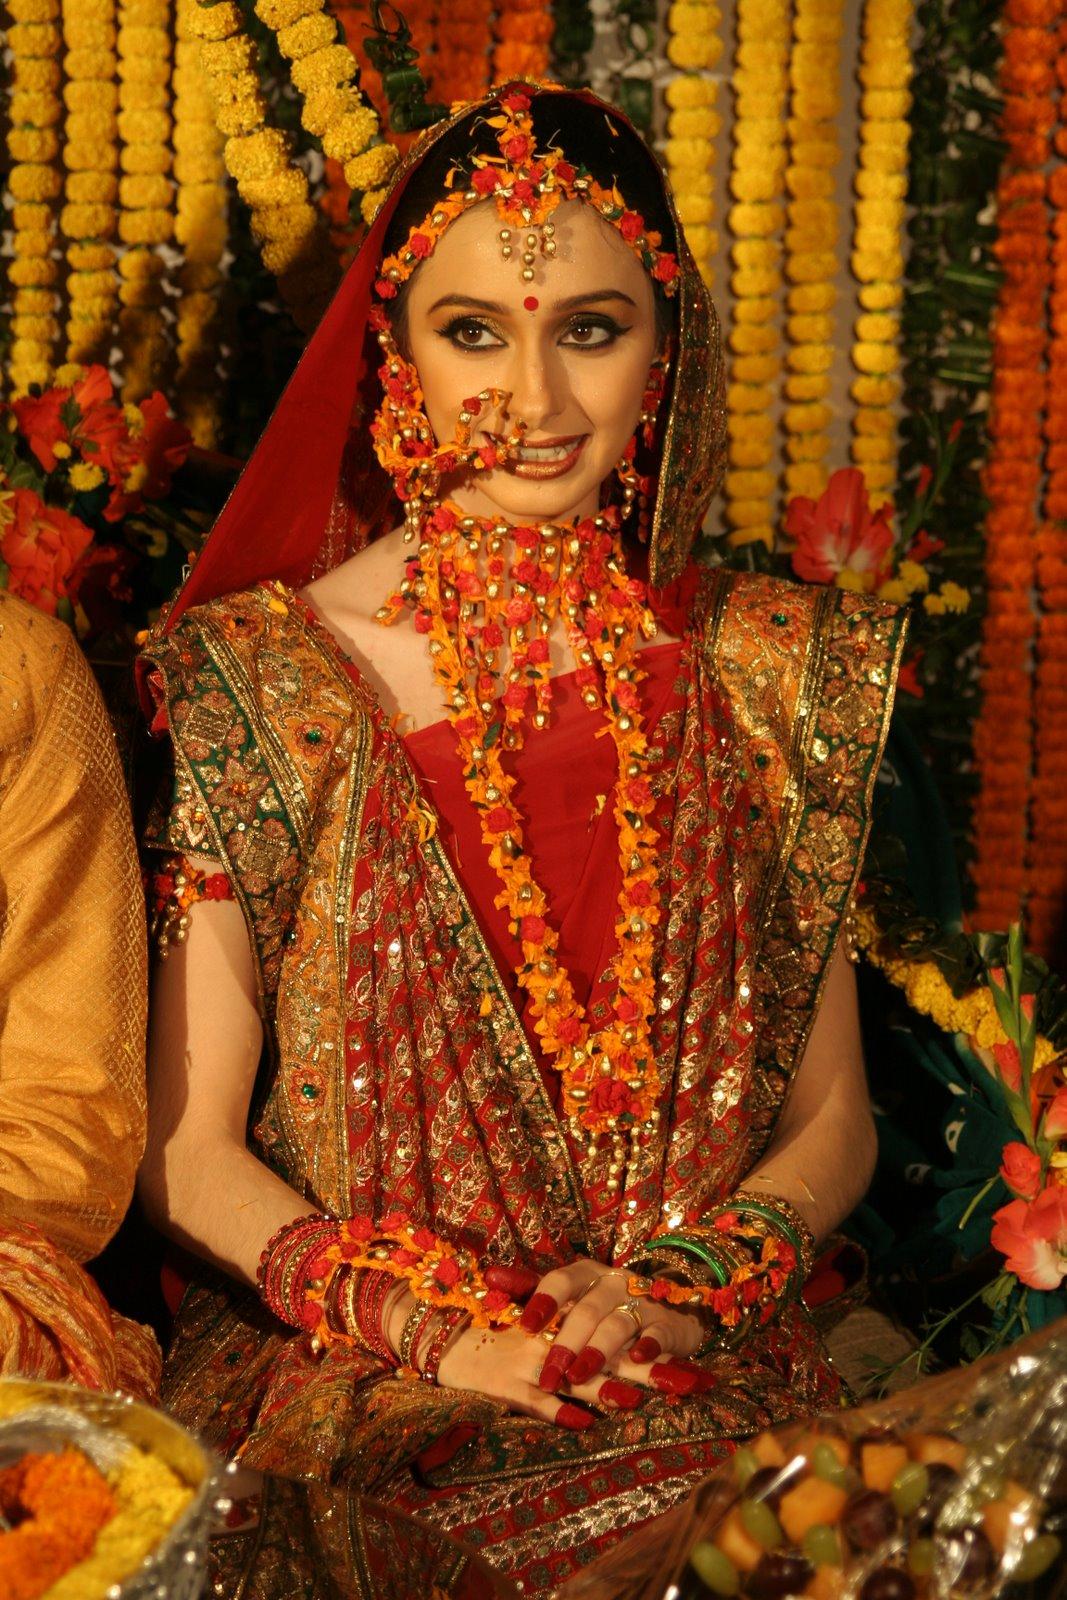 bangladeshi wedding   Flickr - Photo Sharing!